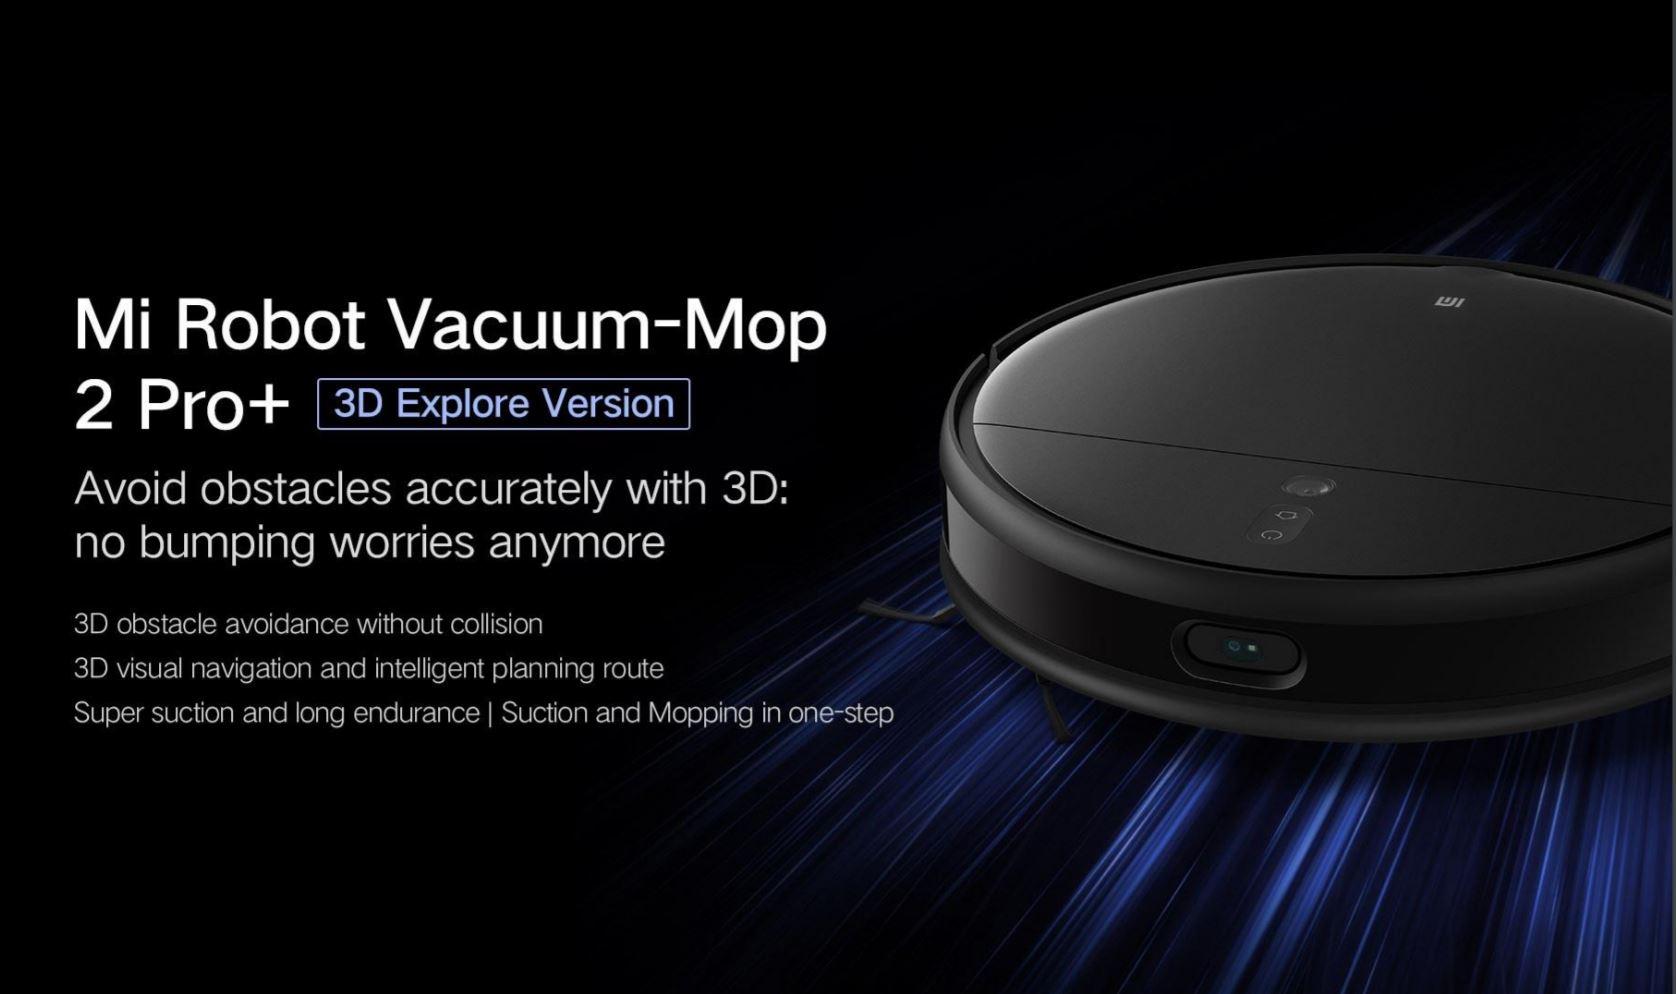 Xiaomi Mi Robot Vacuum Mop 2 Pro + - 3D Version